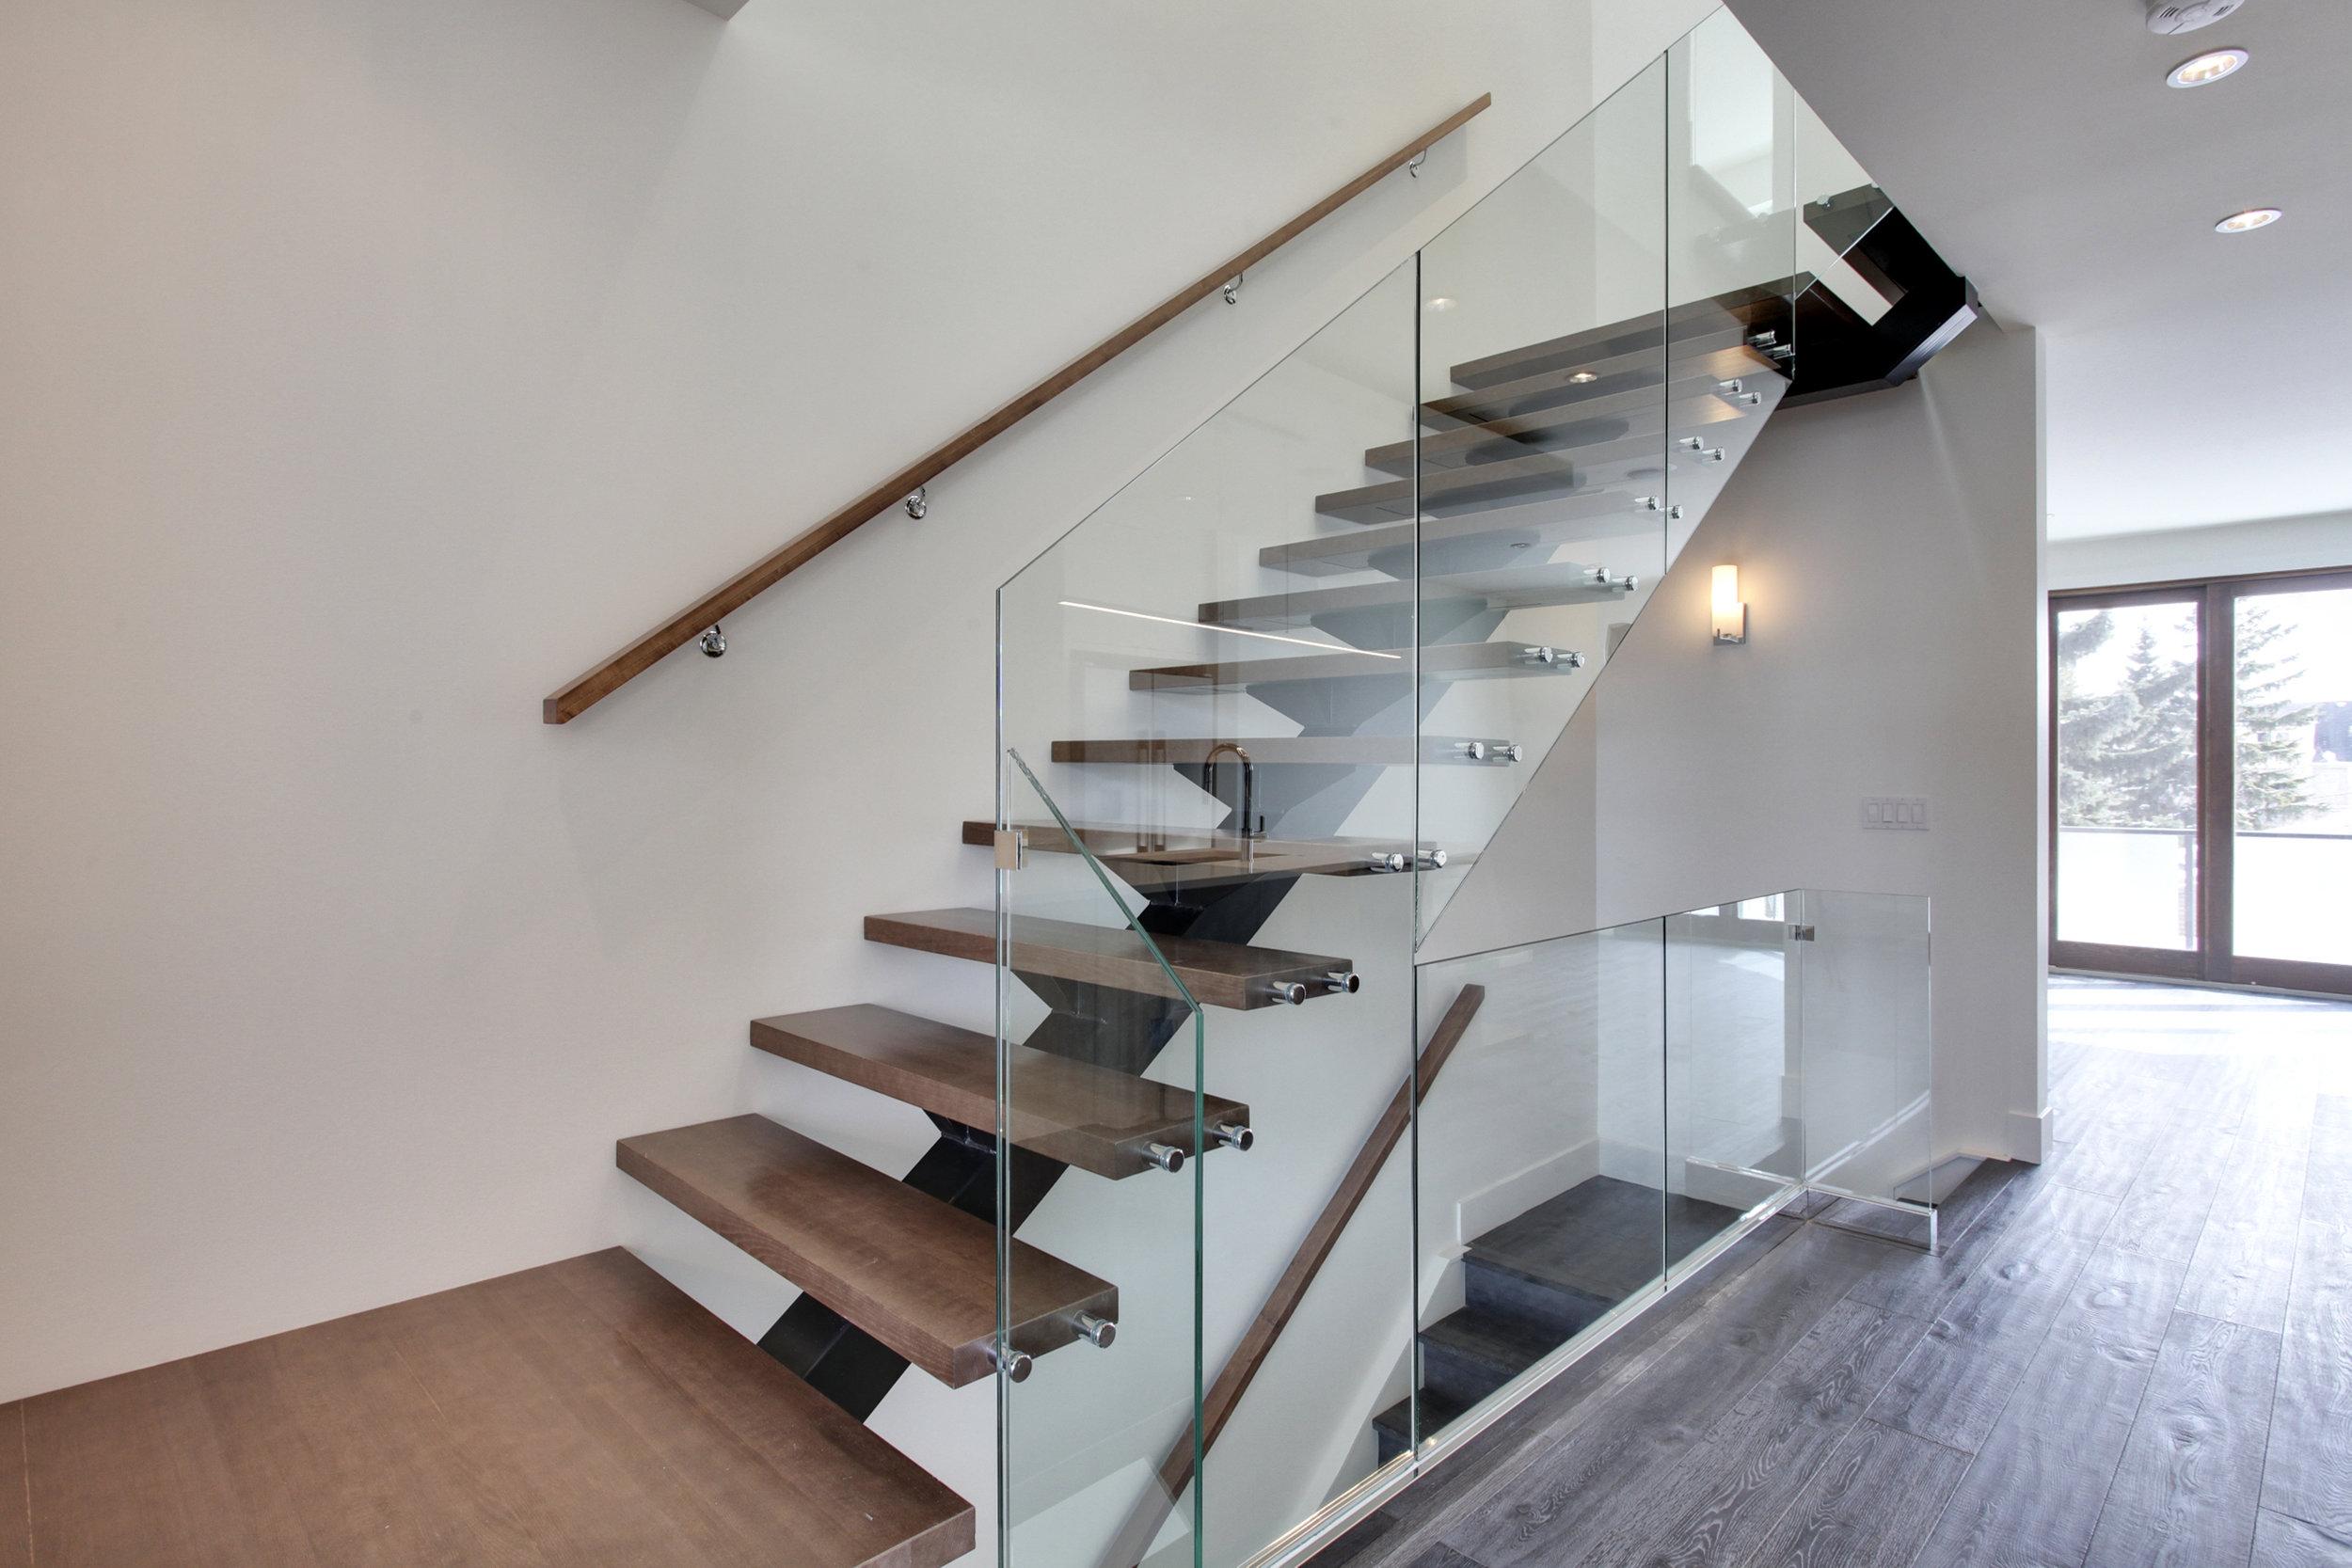 Parcside - Interior Stair